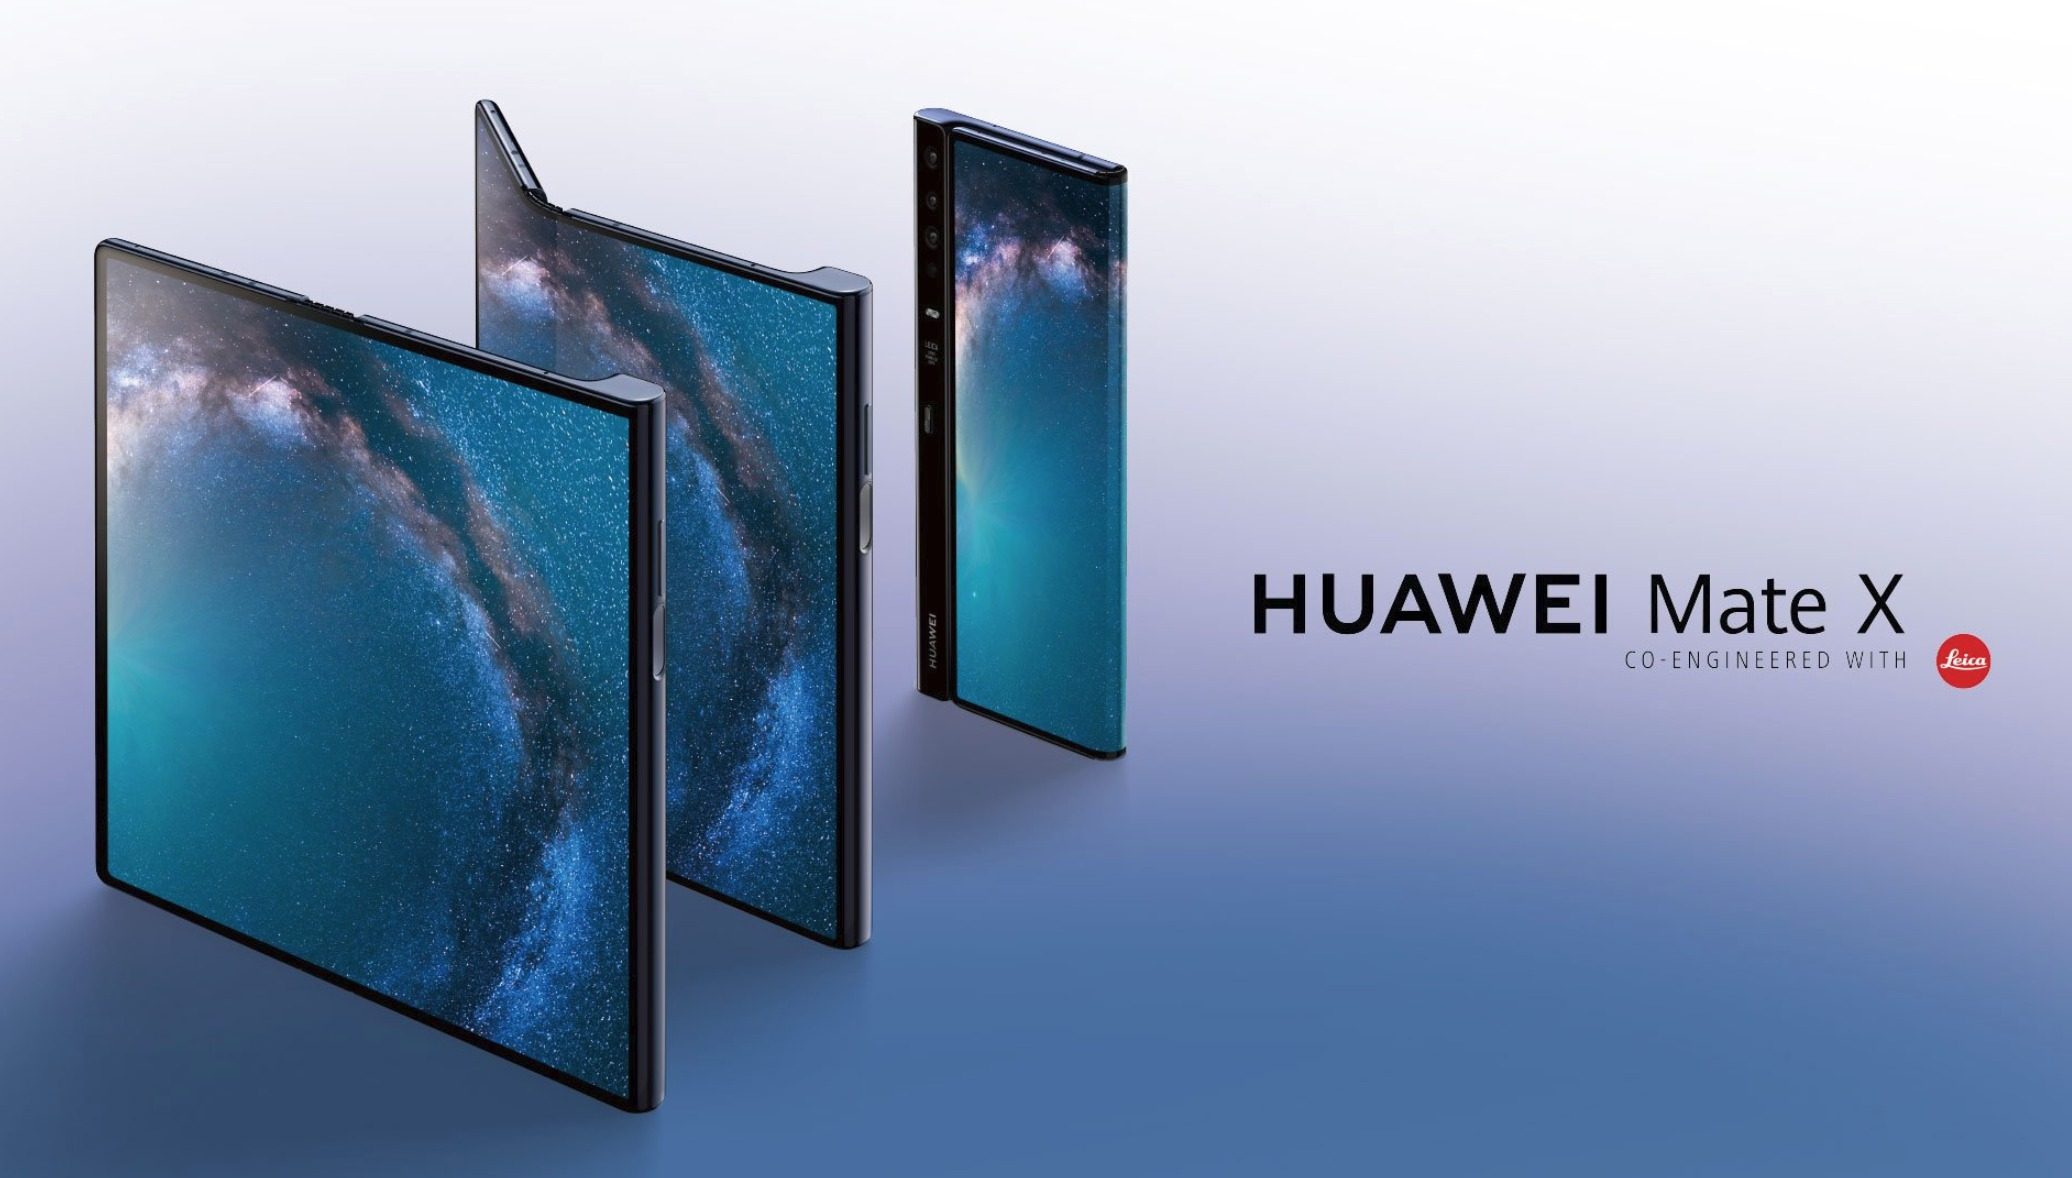 Huawei Mate X kommt Marktstart näher und erstes Unboxing-Video